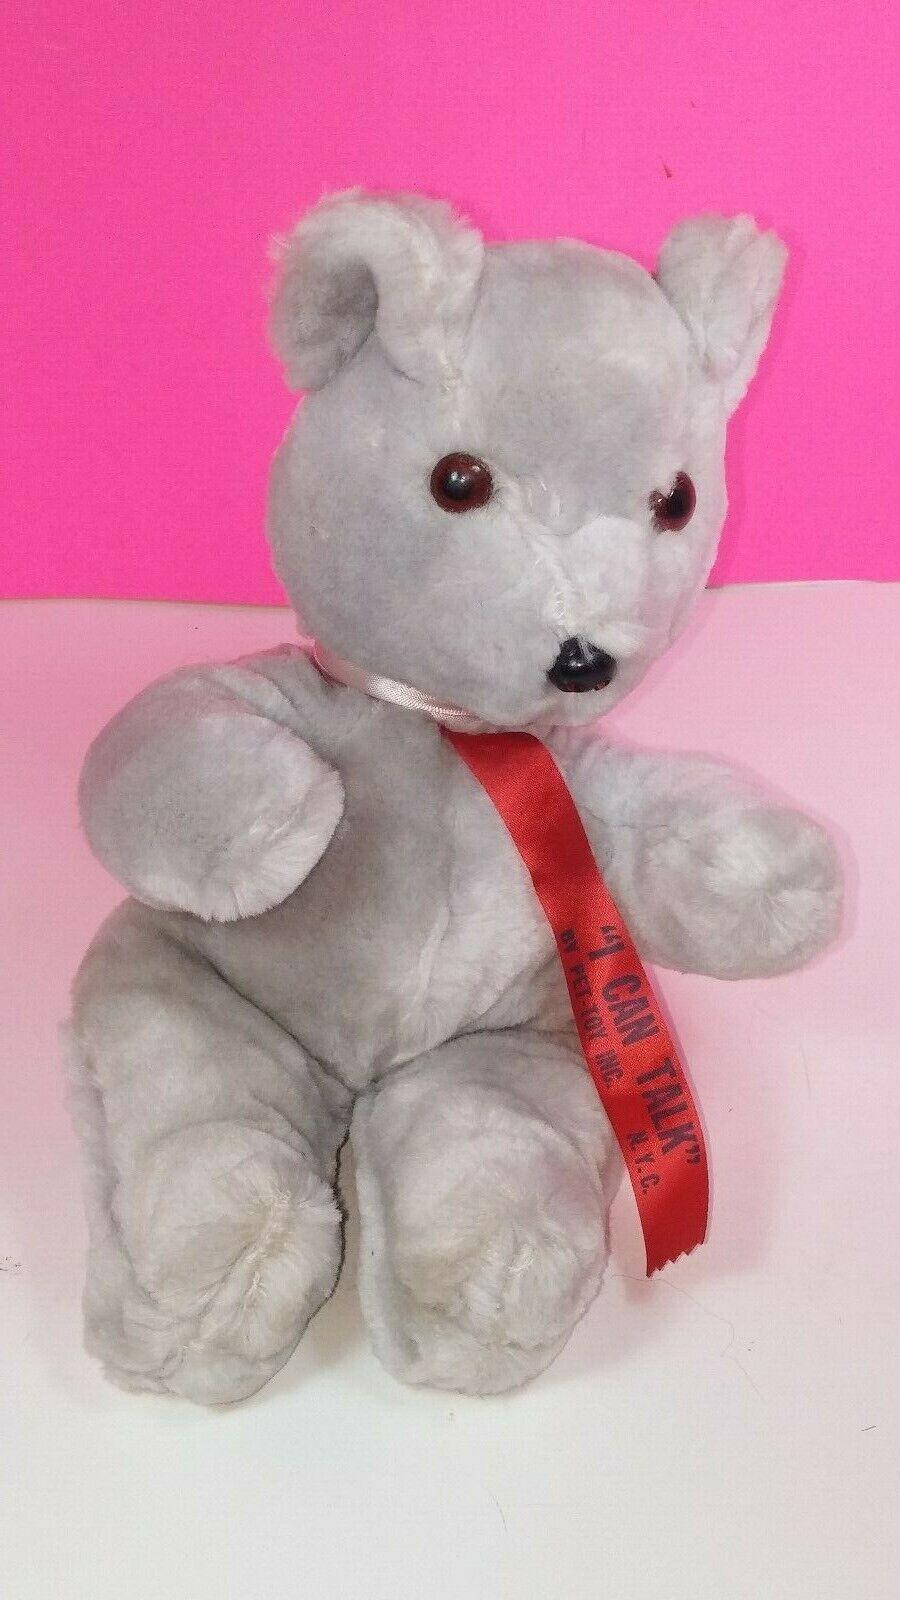 Antique Pet-Toy Wind Up Talking Teddy Bear Vintage Plush NY Works